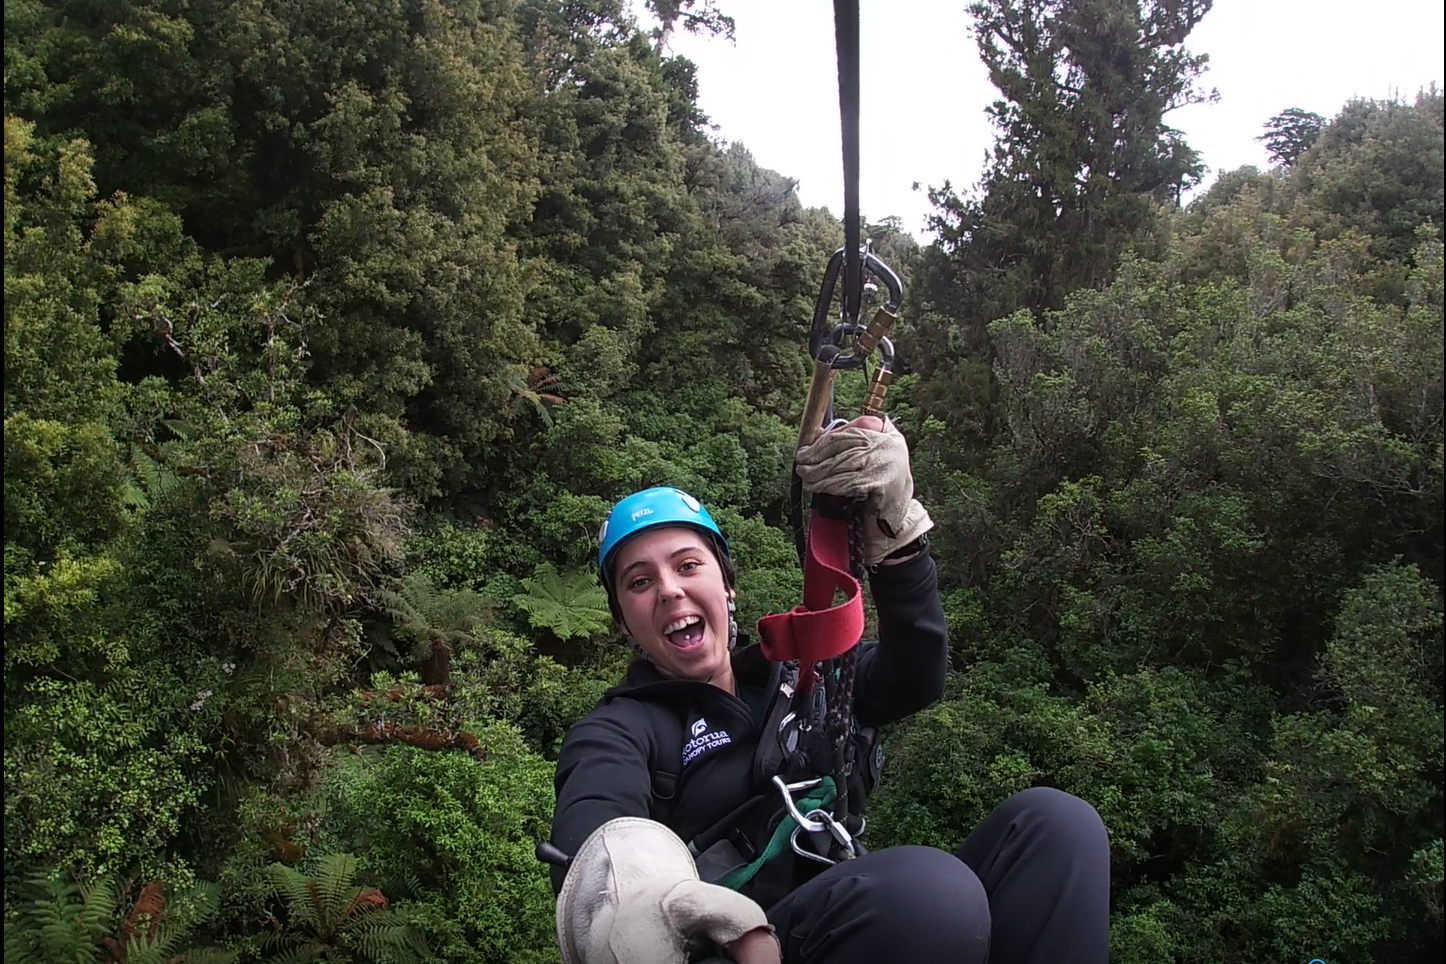 Eco Tours guide Santraea at Rotorua Canopy Tours